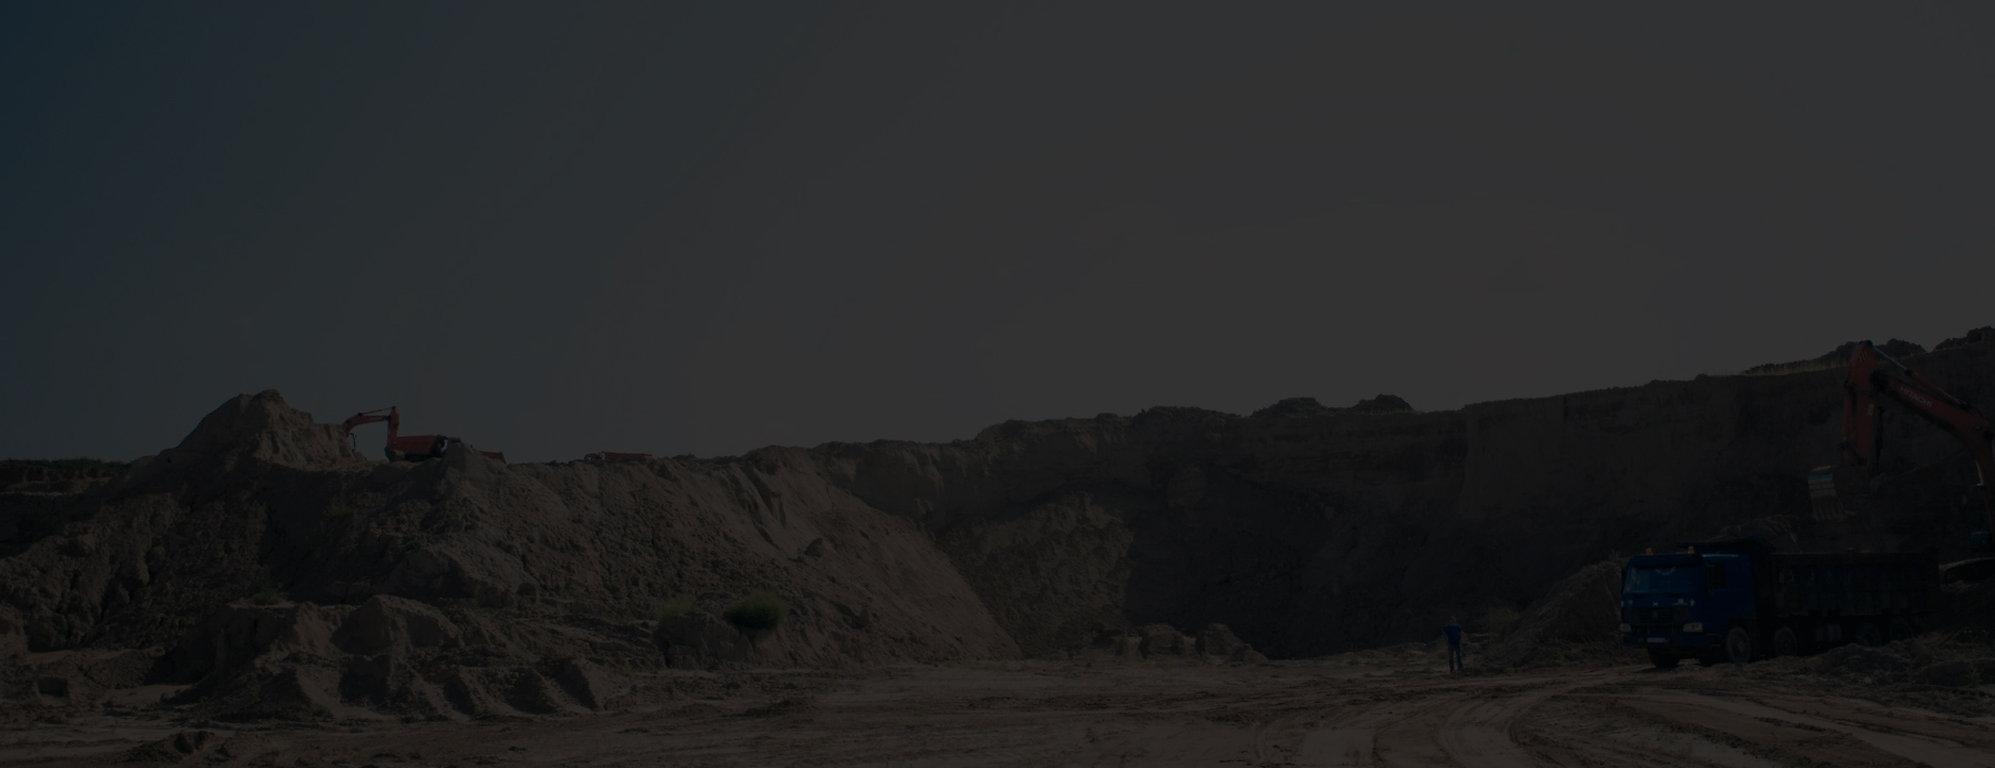 песок.jpg